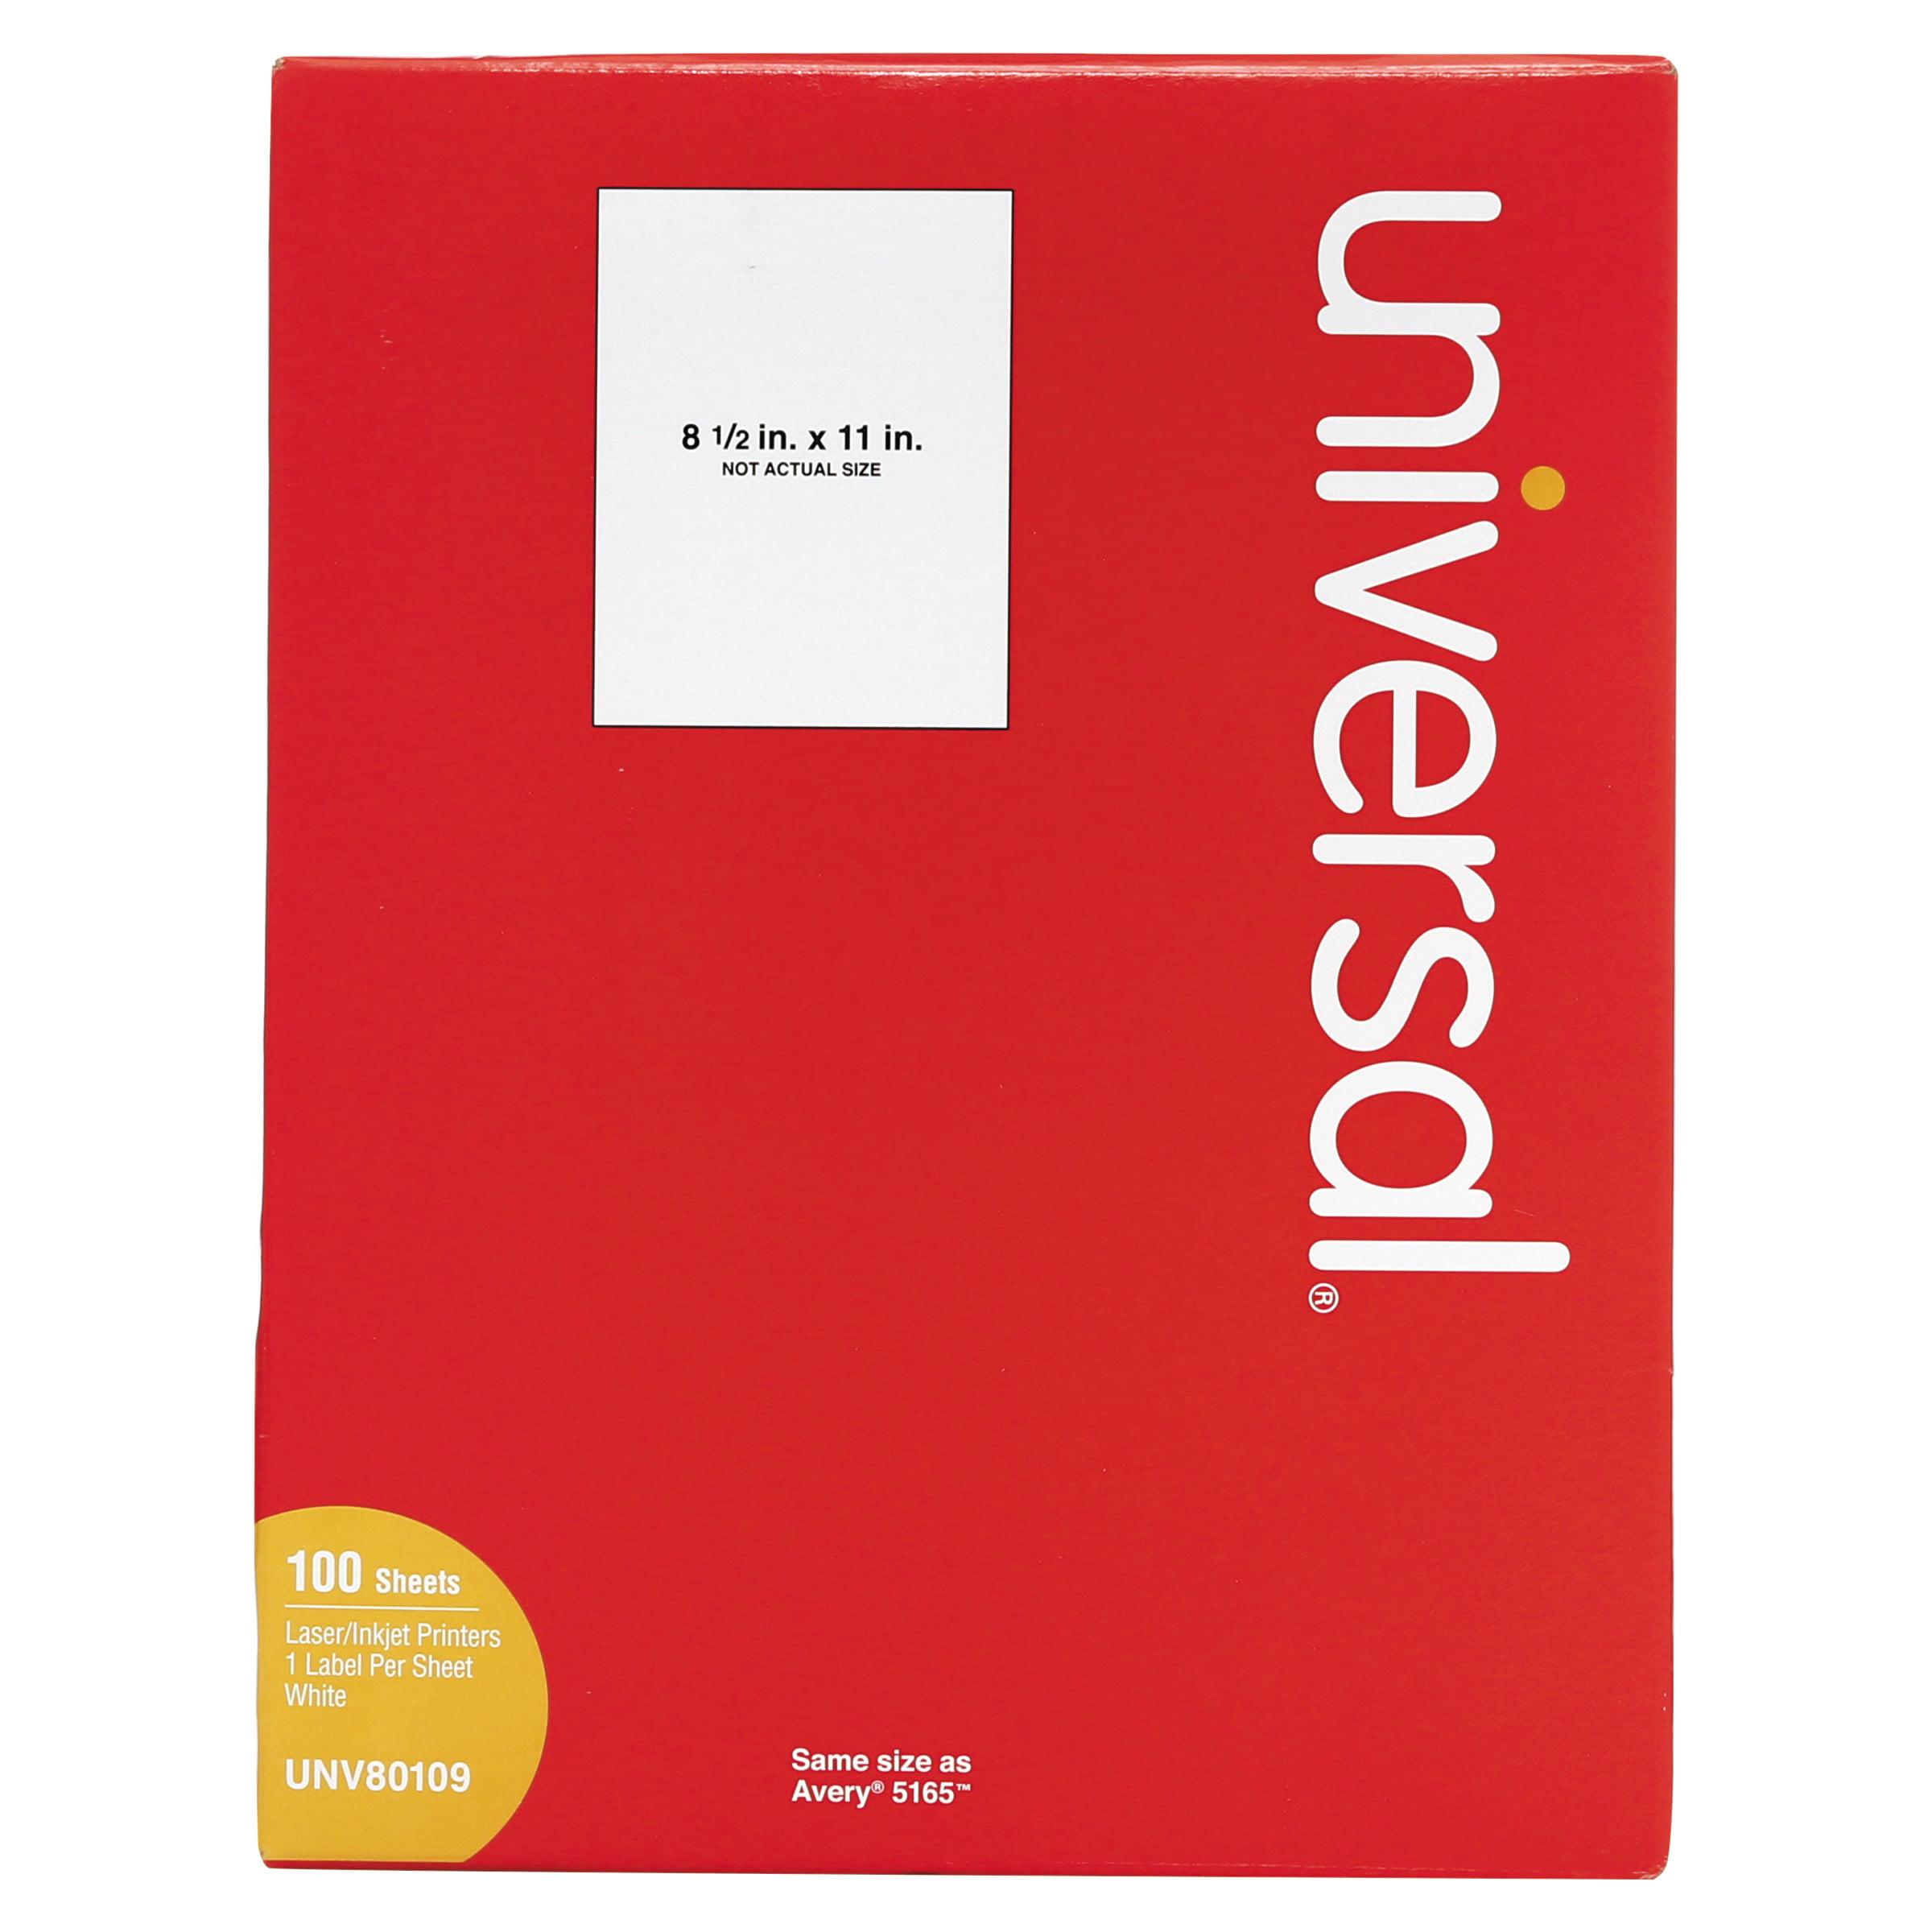 Universal Laser Printer Permanent Labels, 8 1/2 x 11, White, 100/Box -UNV80109